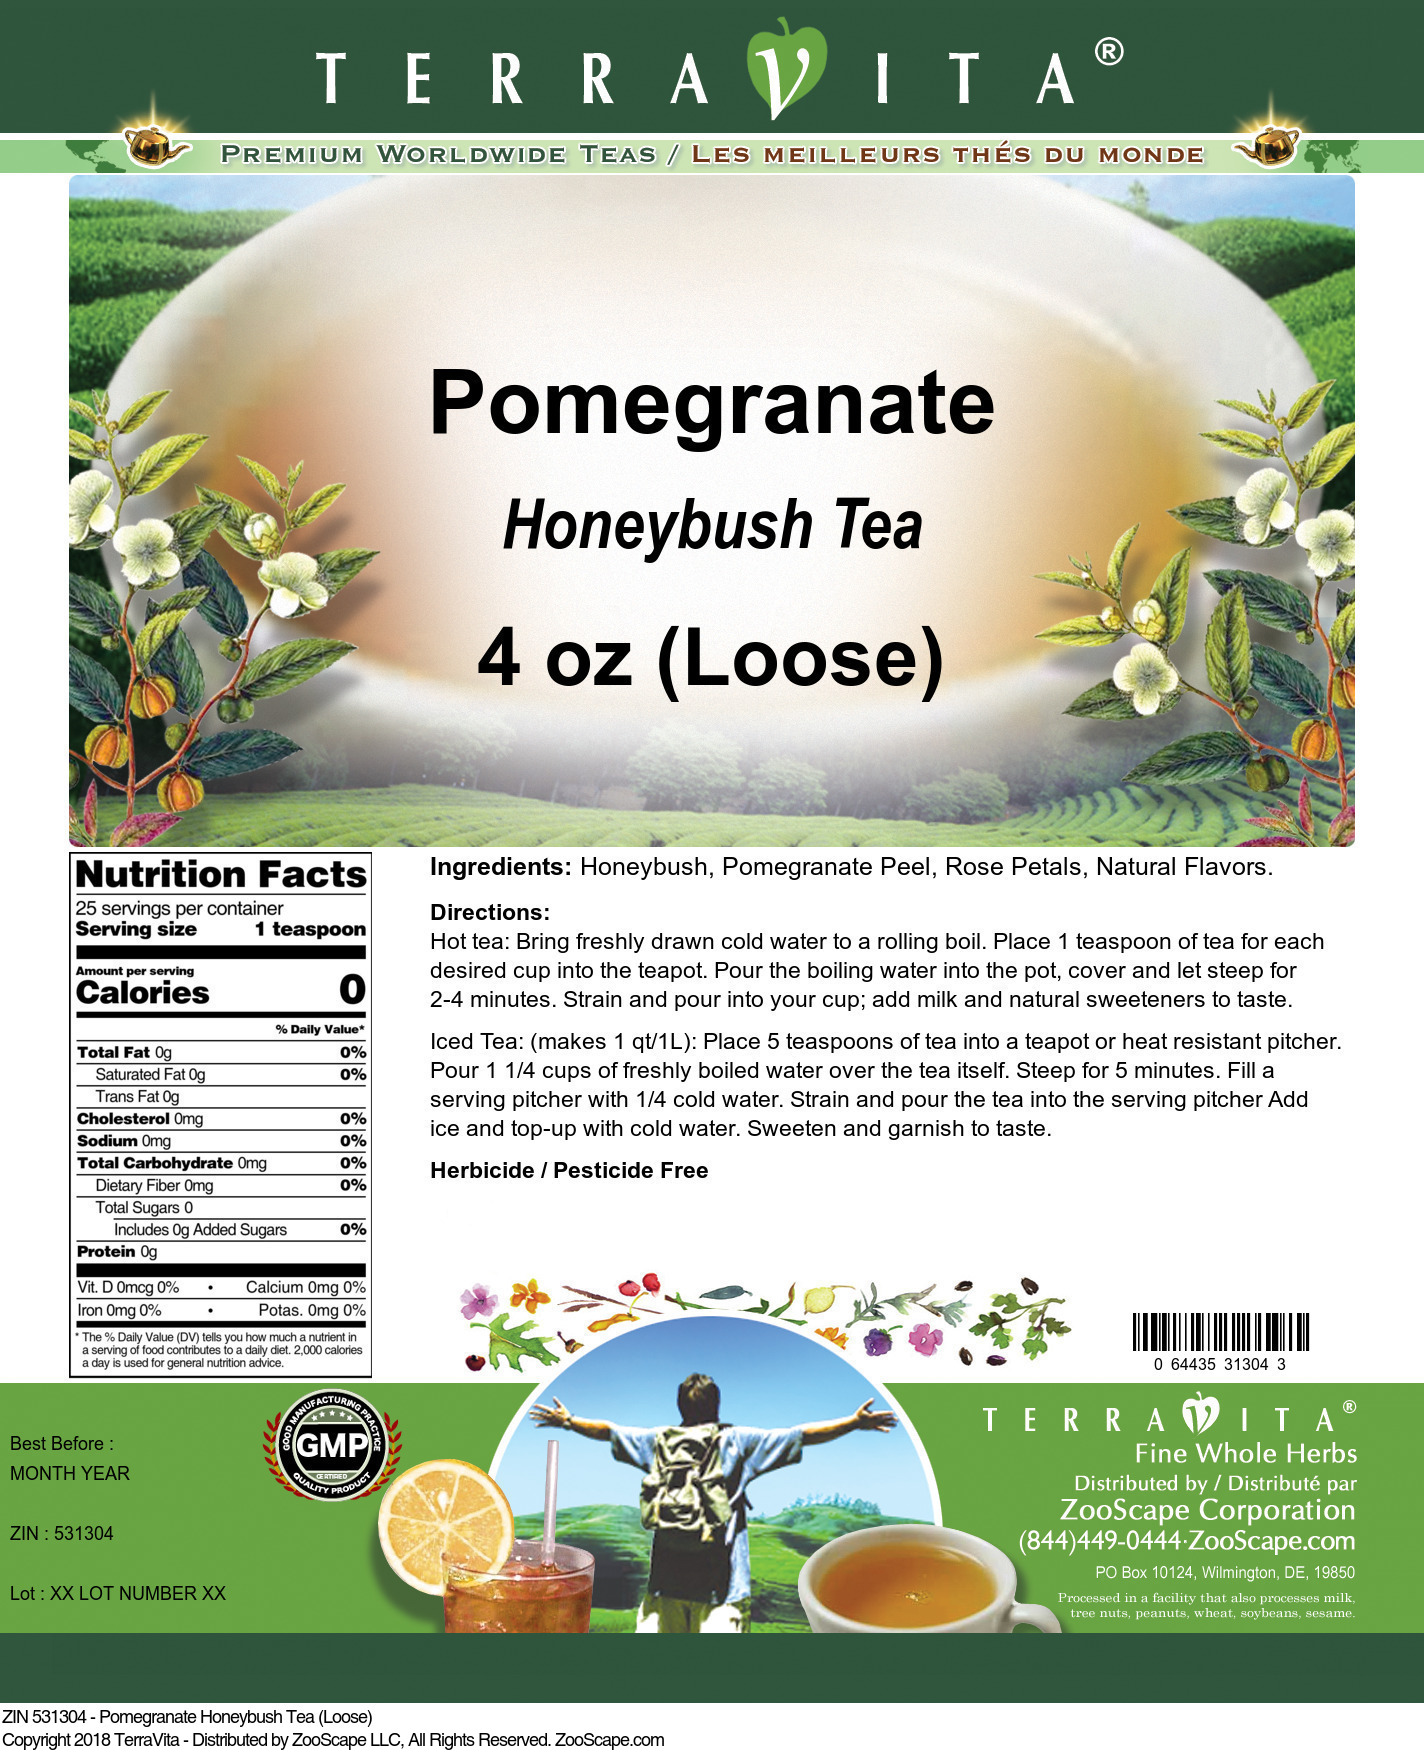 Pomegranate Honeybush Tea (Loose)